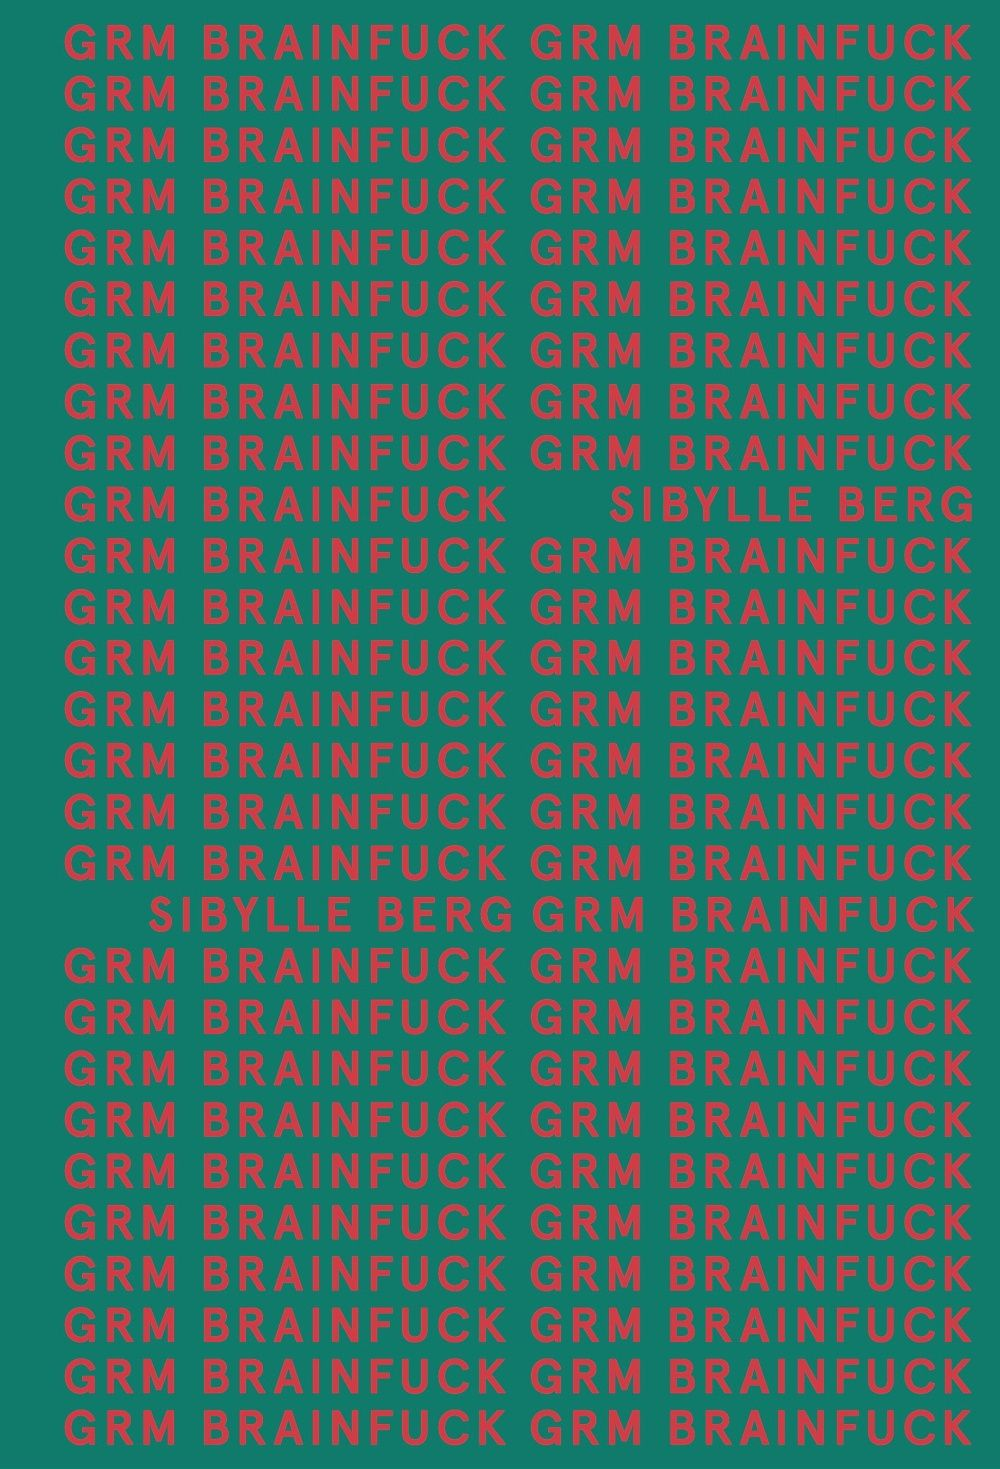 GRM BRAINFUCK